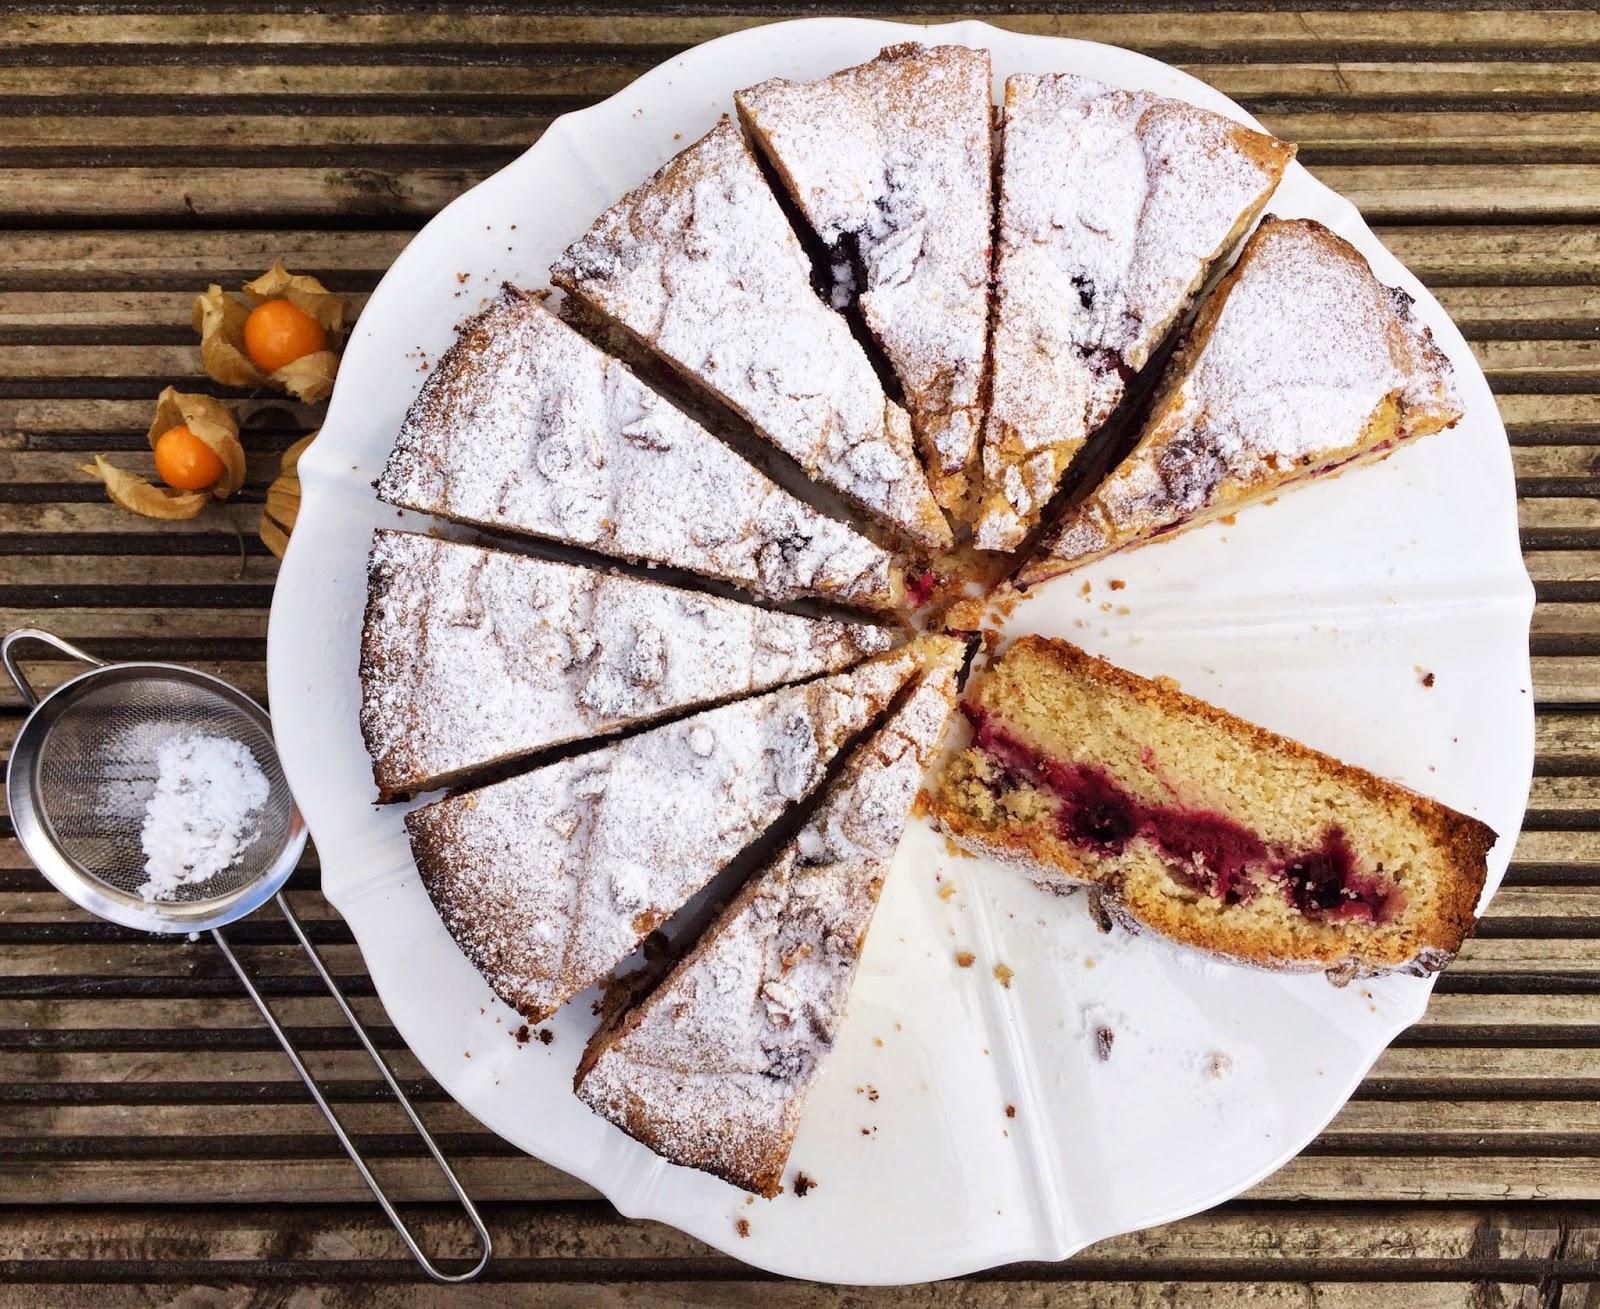 kruche ciasto, orzechy pekan, owoce, ptysiu mietowy